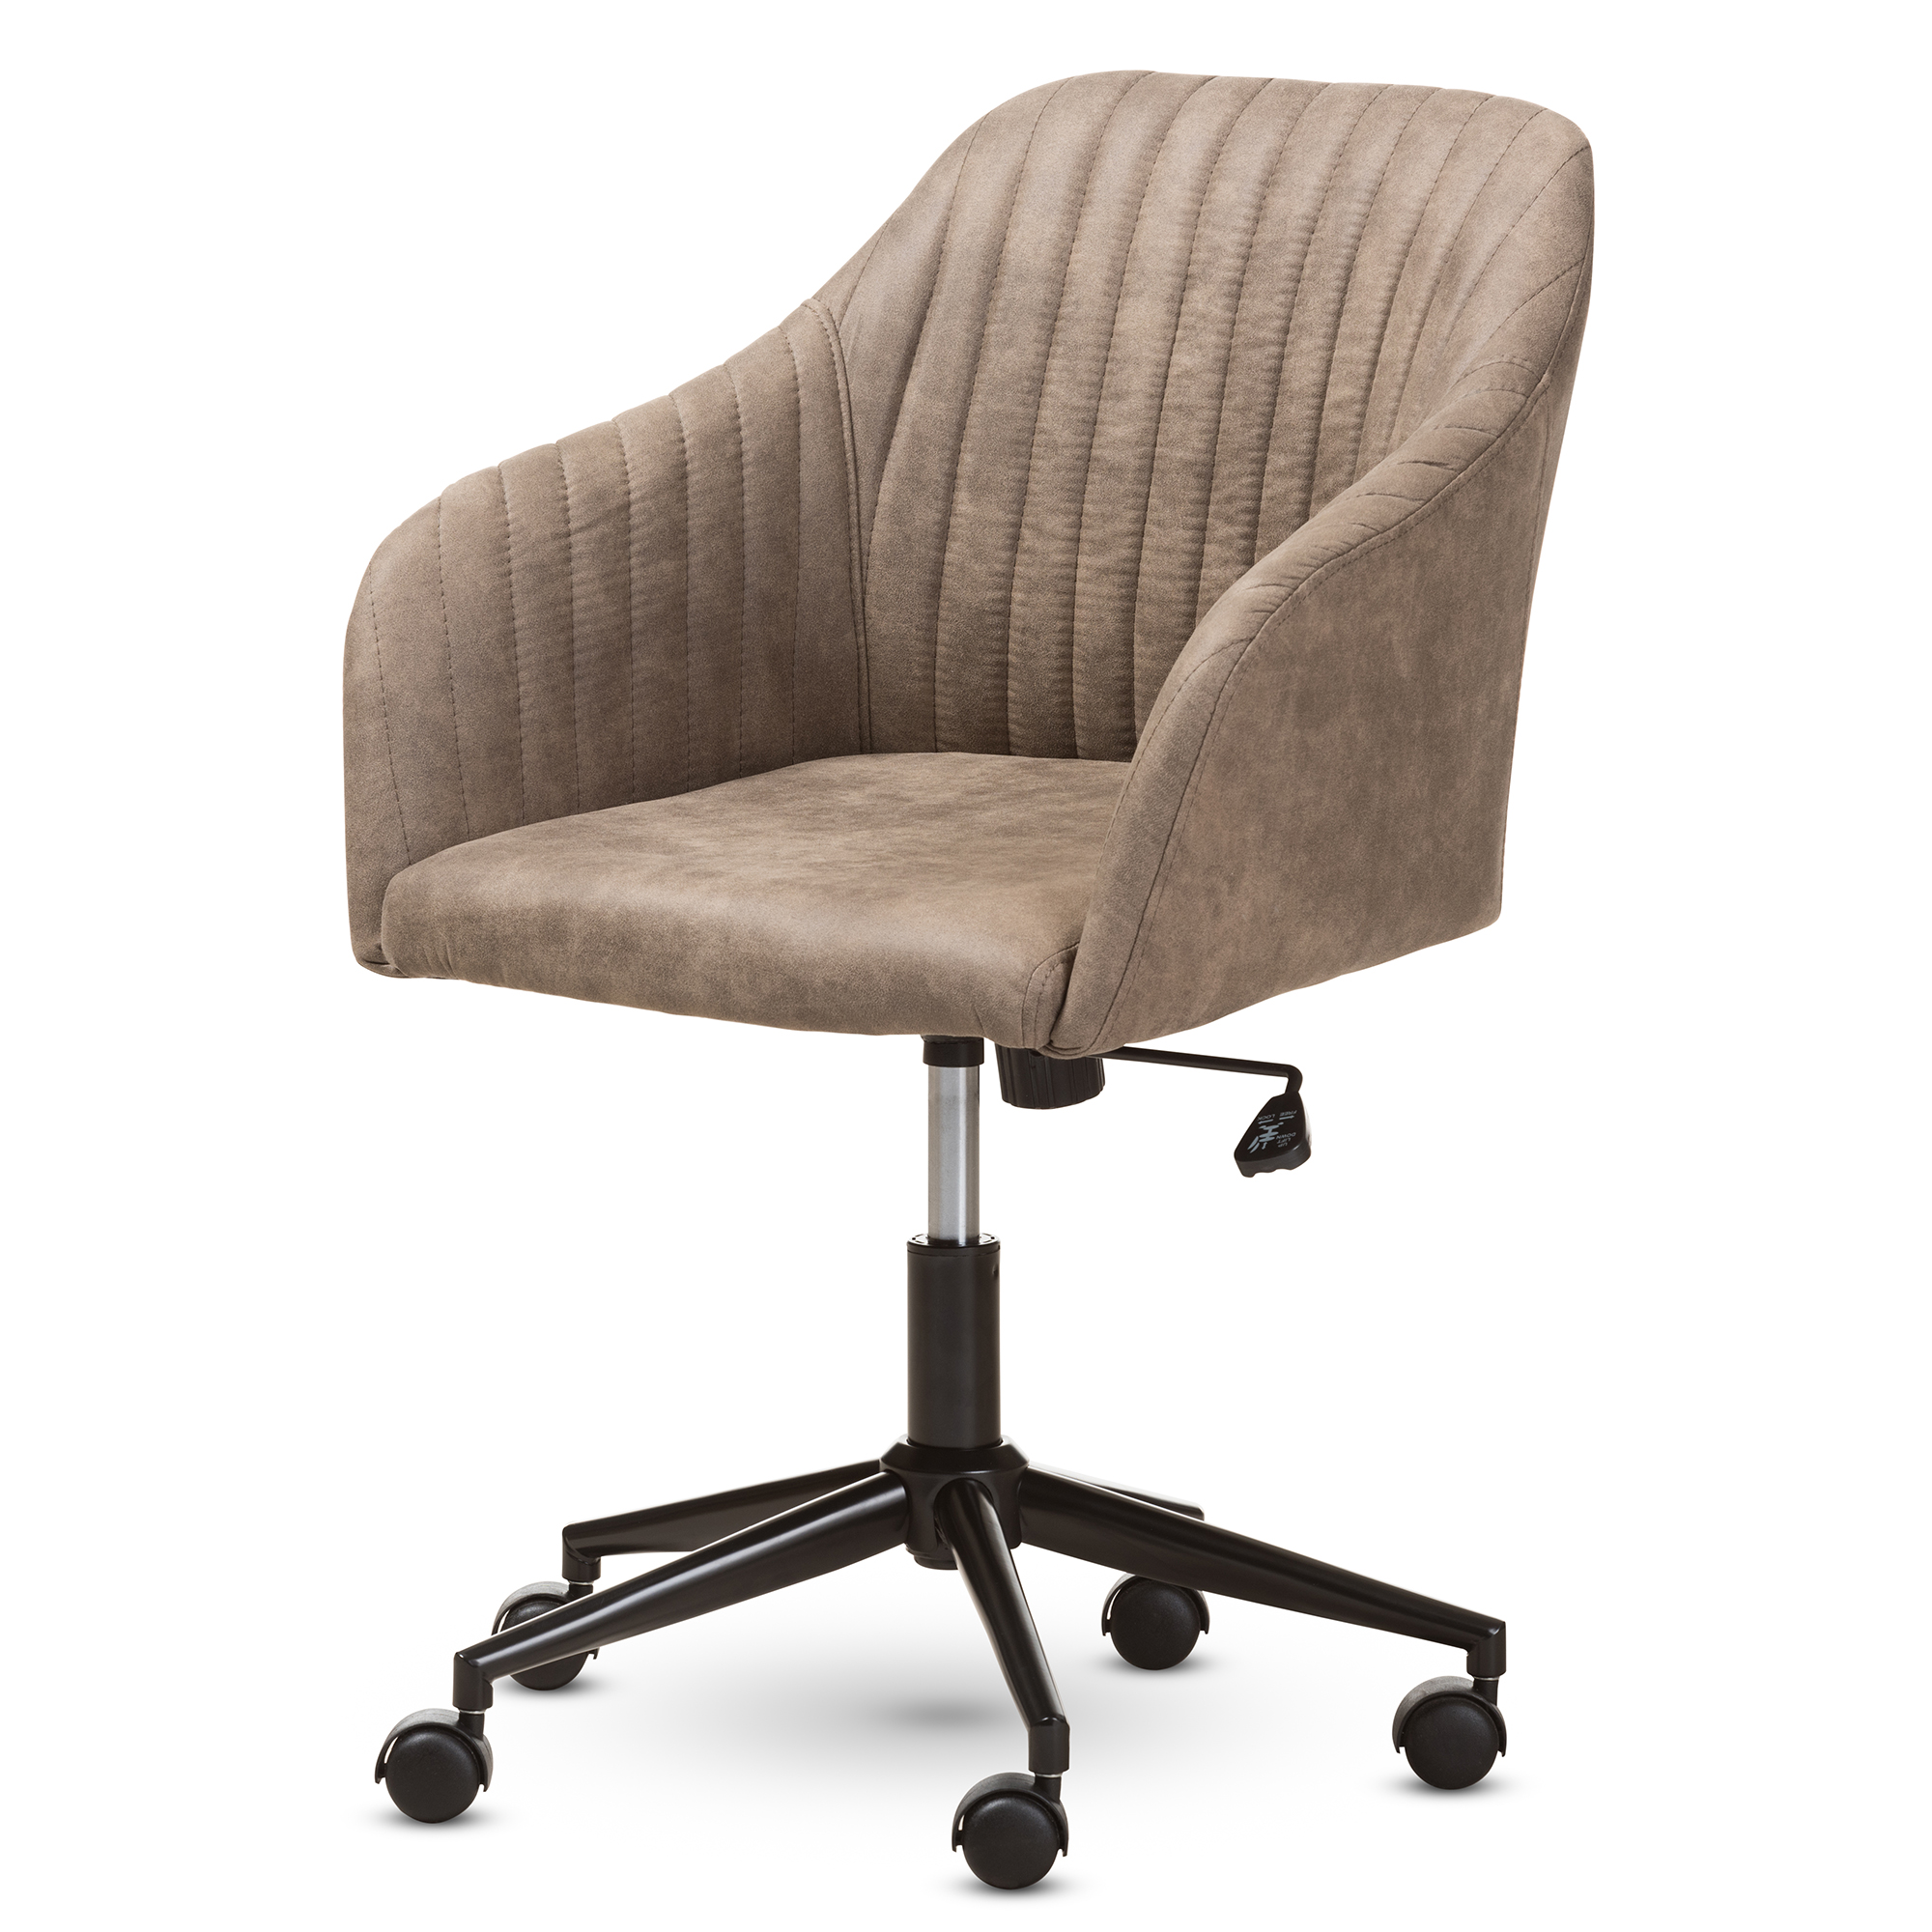 Image of: Baxton Studio Maida Mid Century Modern Light Brown Fabric Upholstered Office Chair